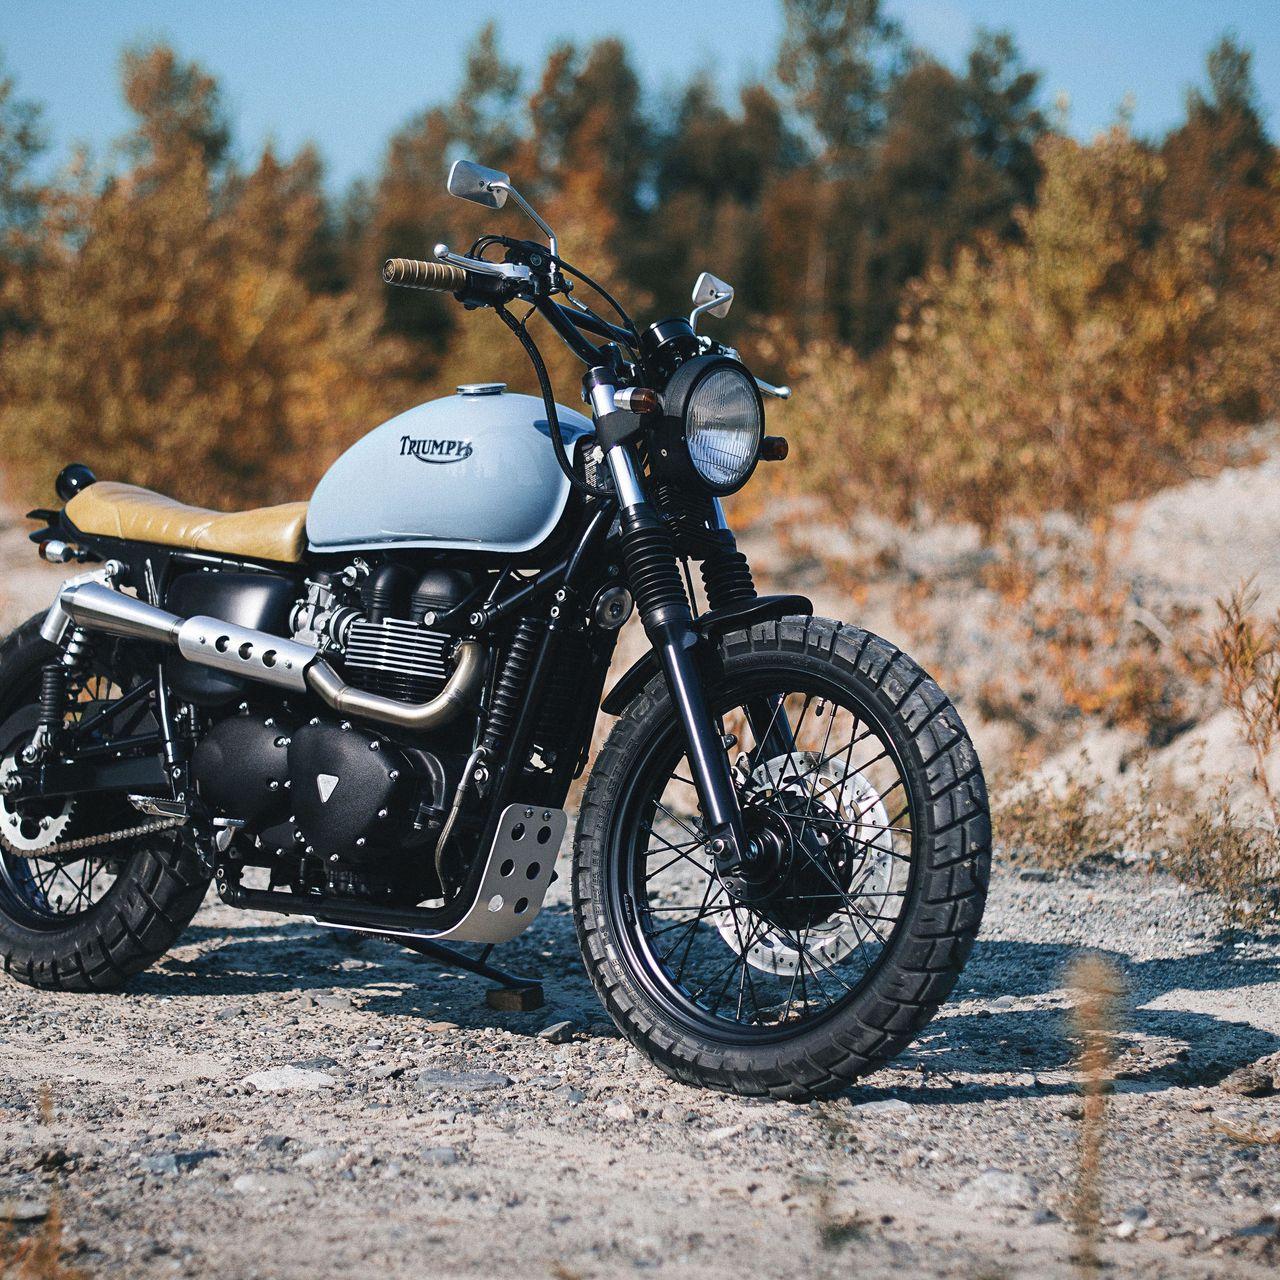 1280x1280 Обои triumph, bonneville, мотоцикл, вид сбоку